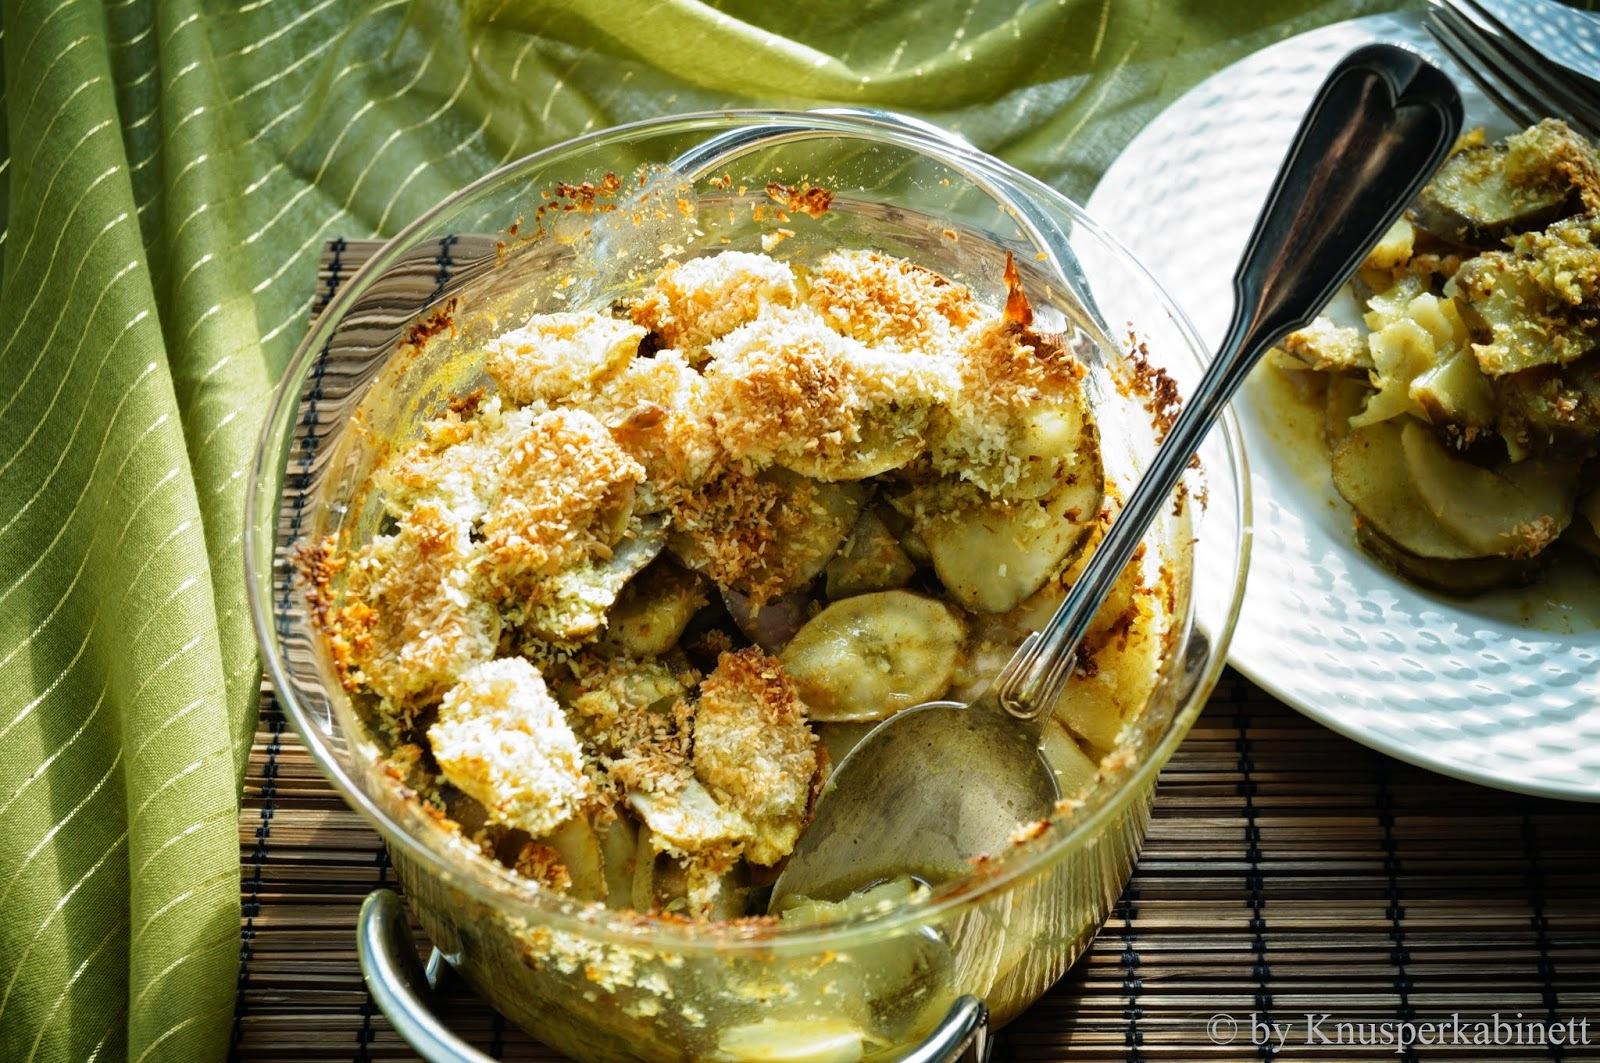 Schwarzwurzel-Topinambur-Auflauf an Kokos-Curry-Sauce